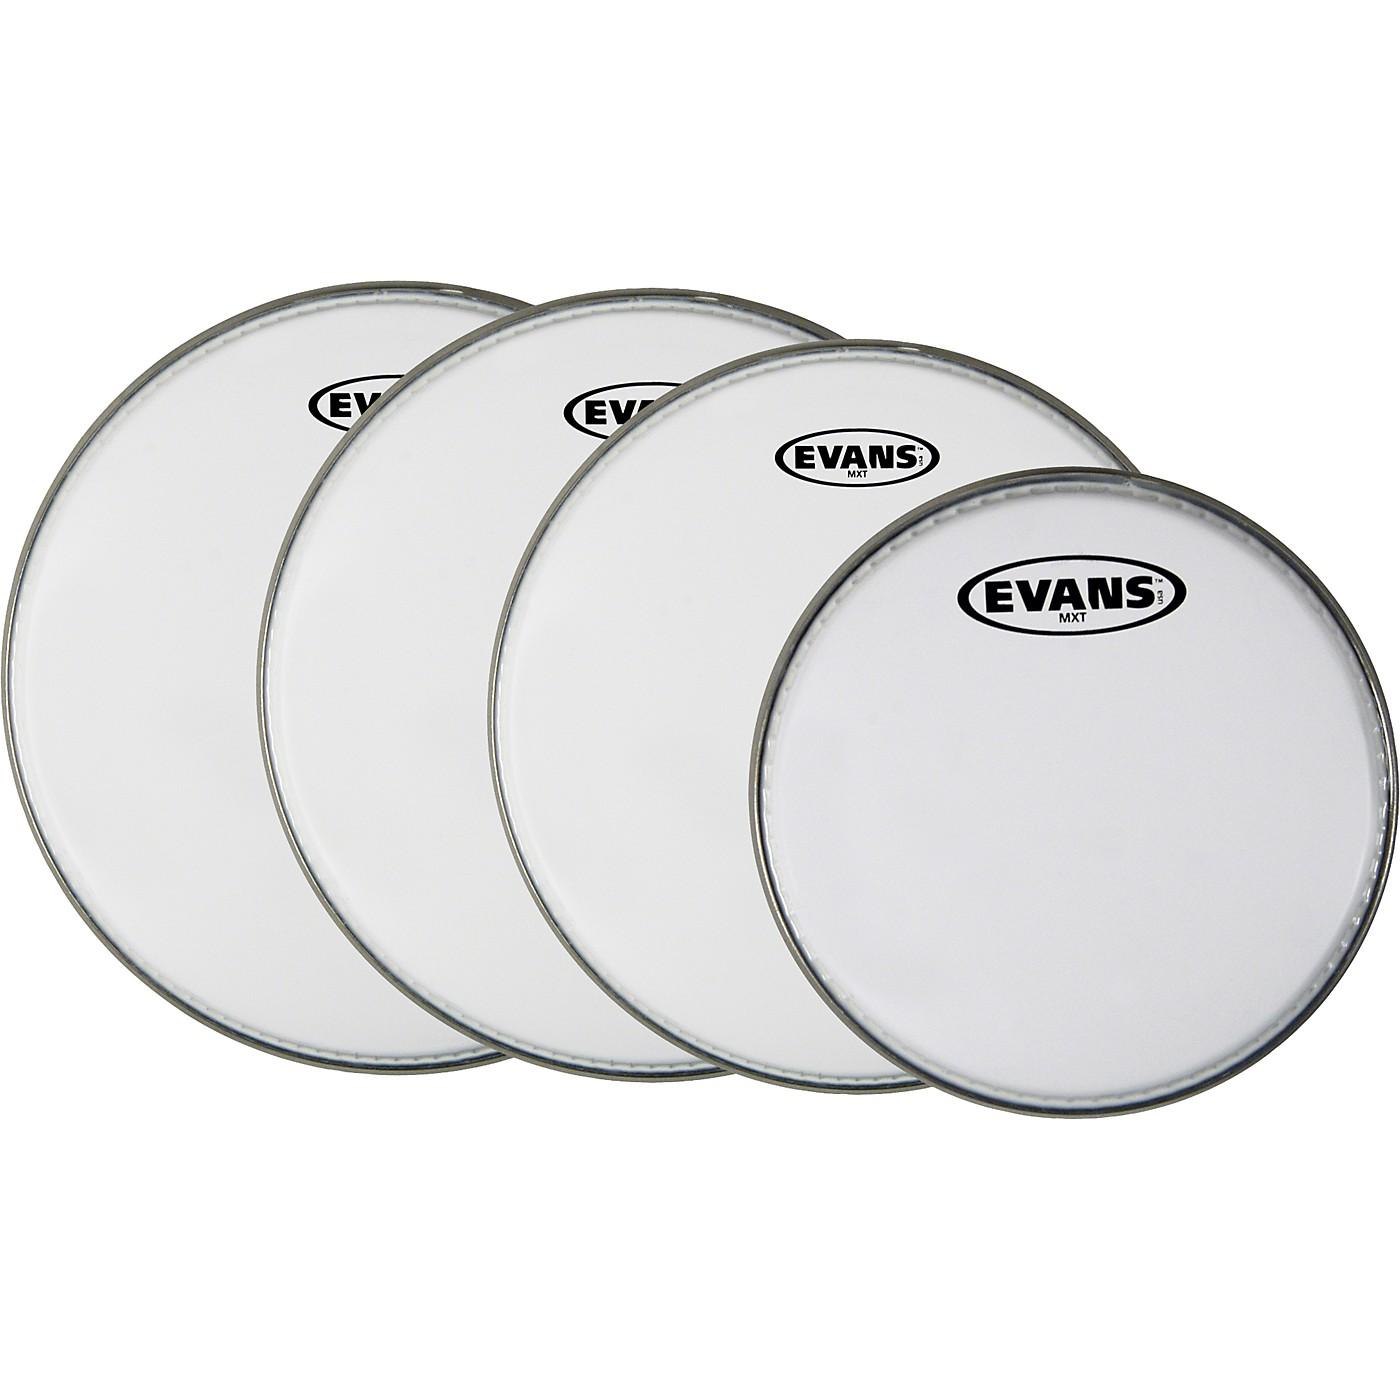 Evans MX White Tenor Drumhead 4-Pack thumbnail